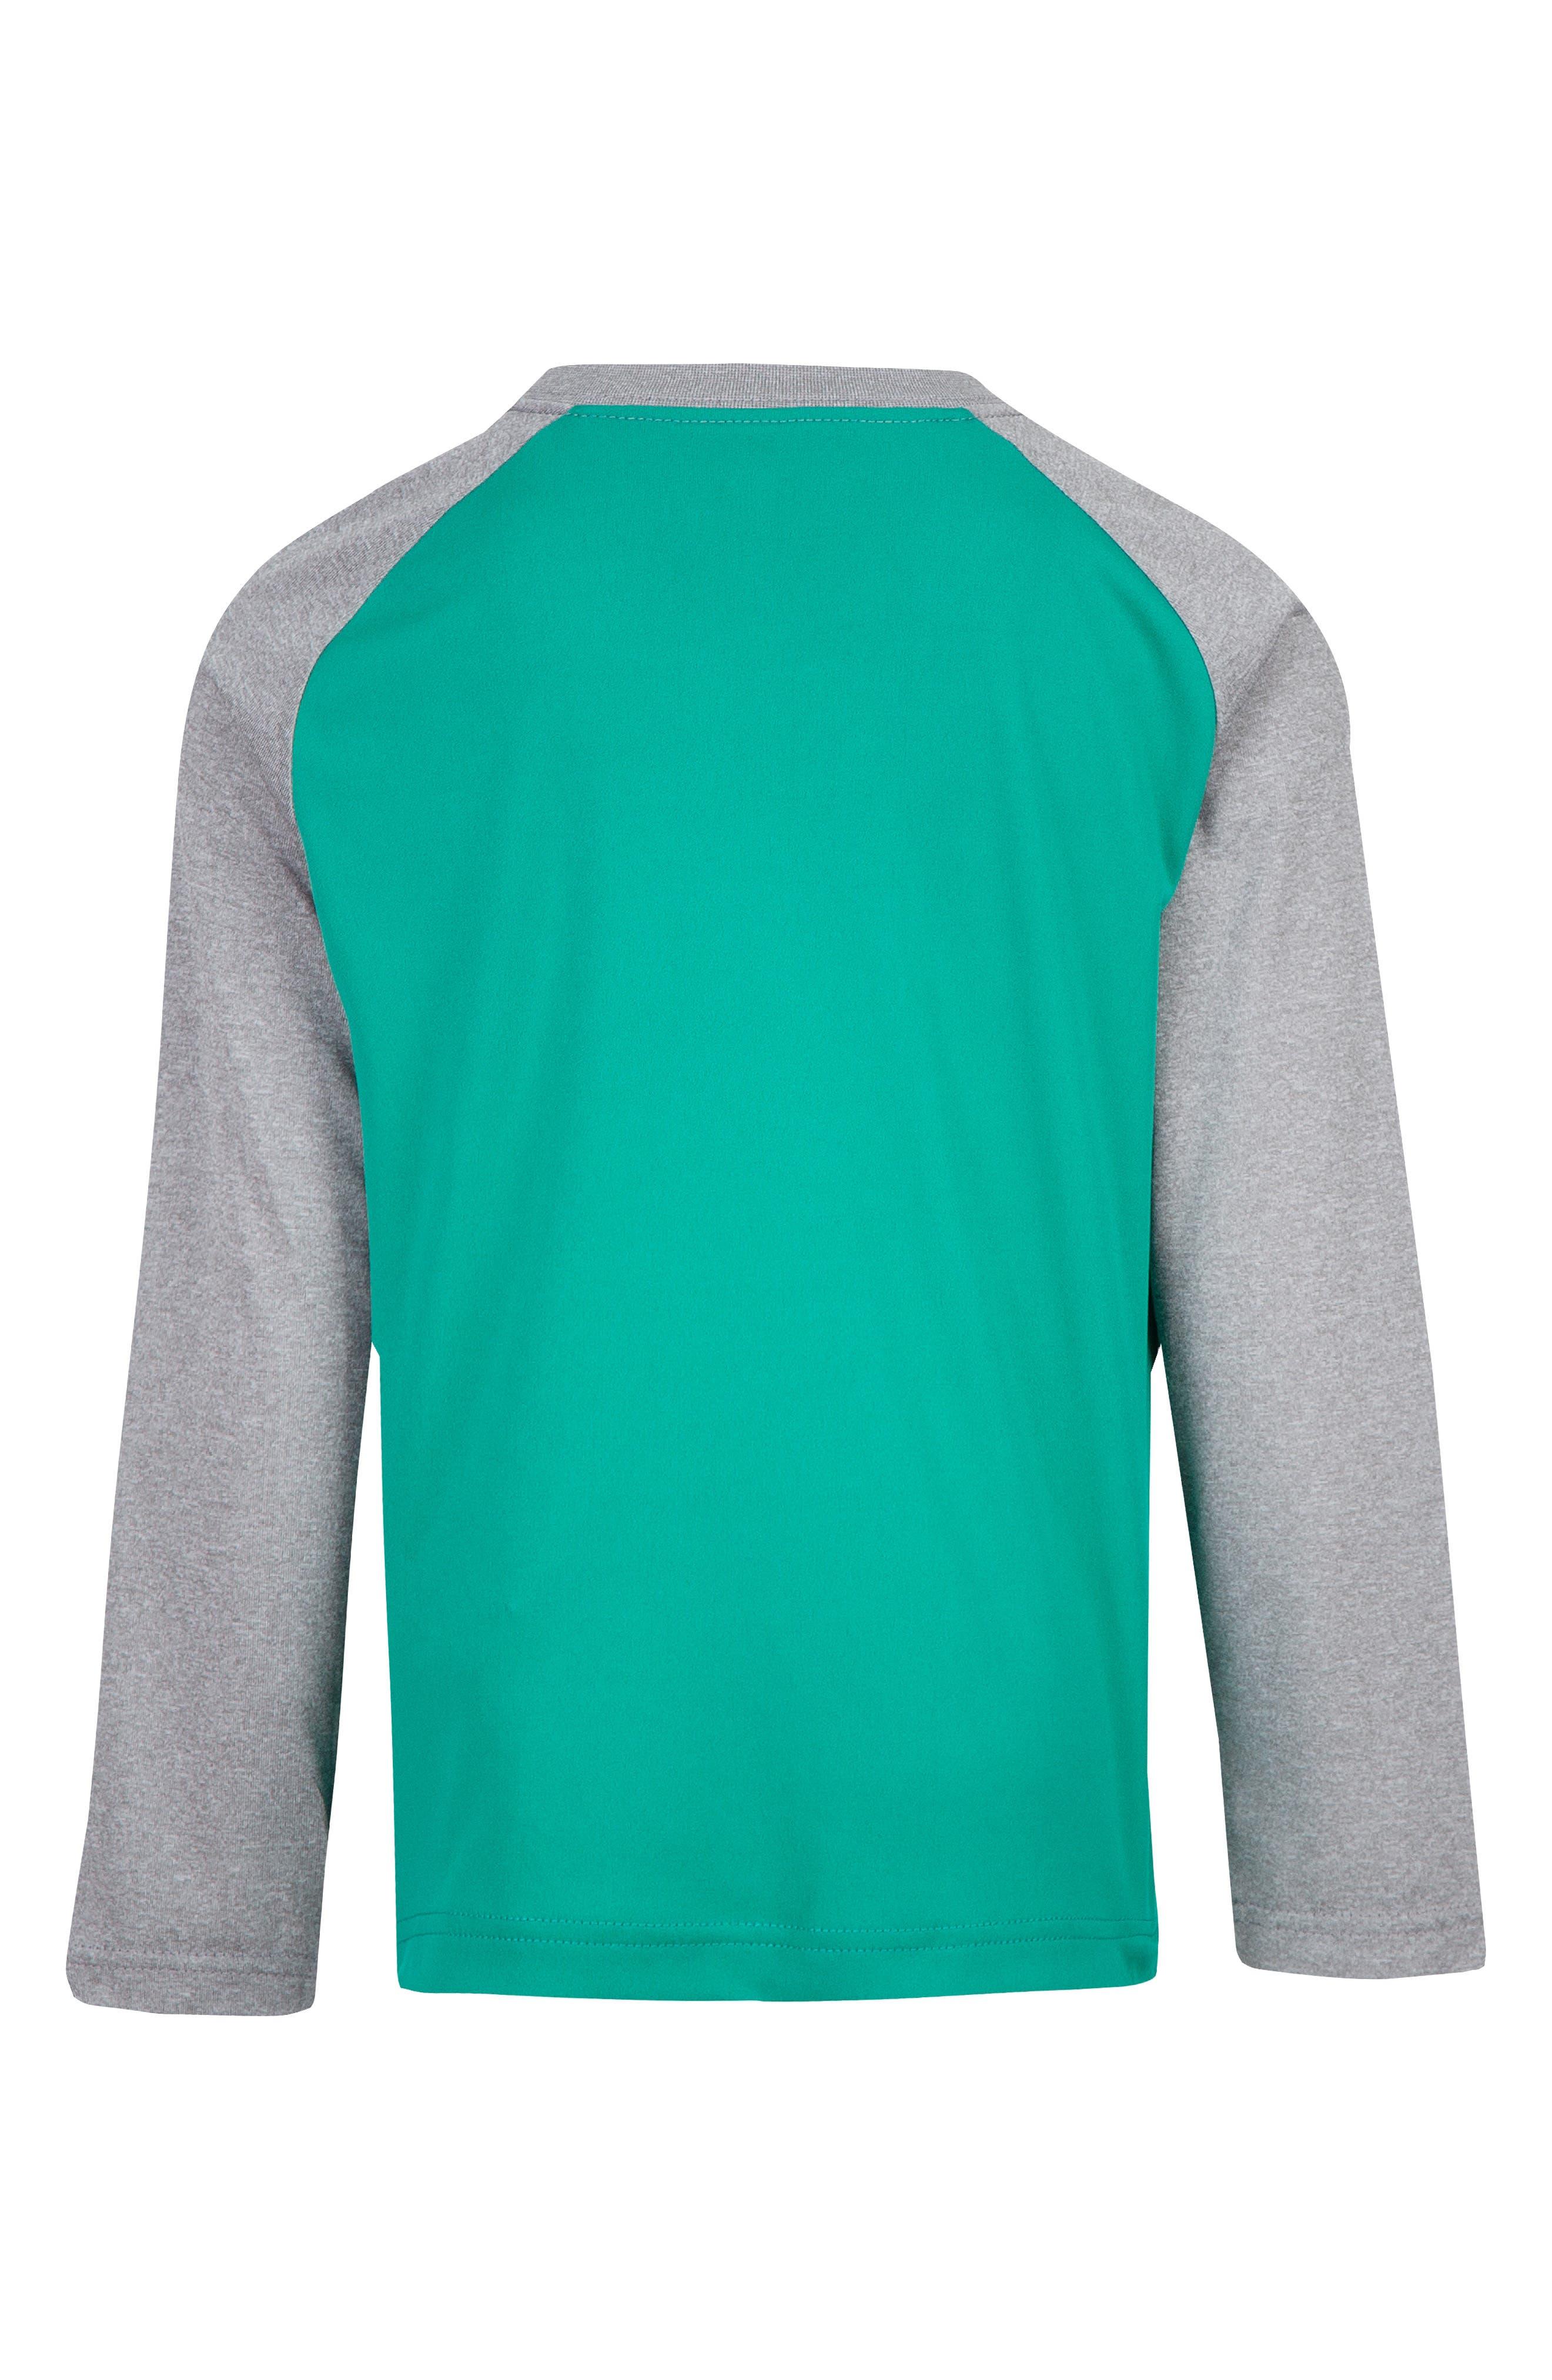 Dry Way Too Fast Raglan T-Shirt,                             Alternate thumbnail 2, color,                             NEPTUNE GREEN